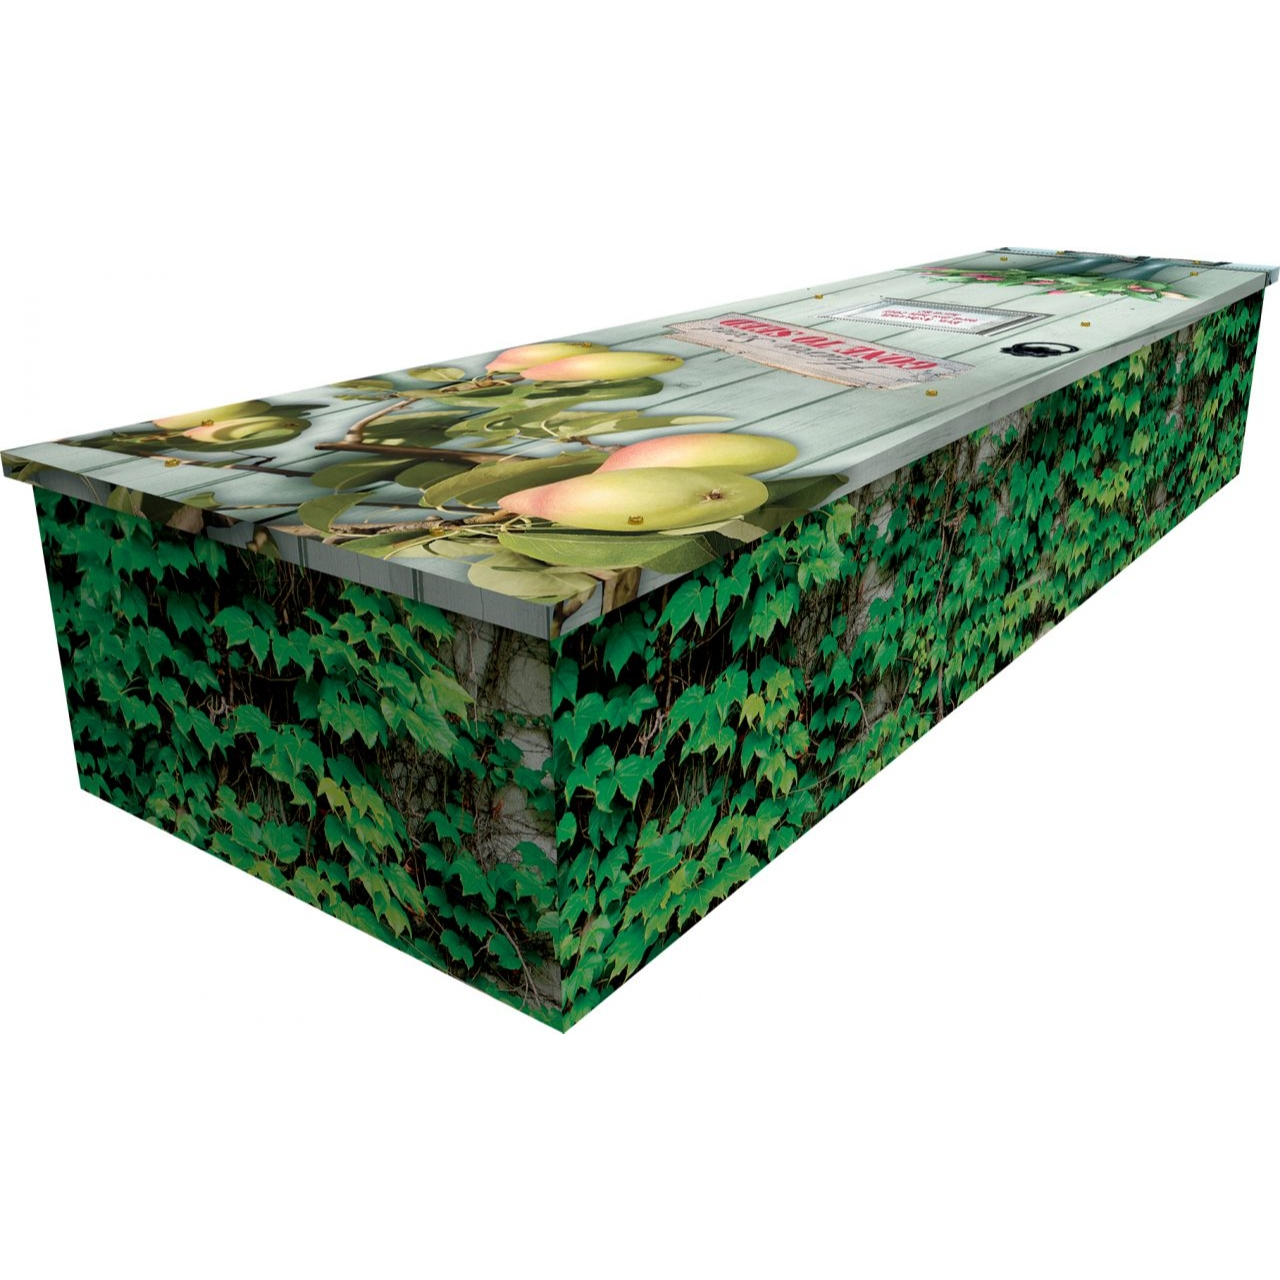 Pear Tree Cardboard Coffin